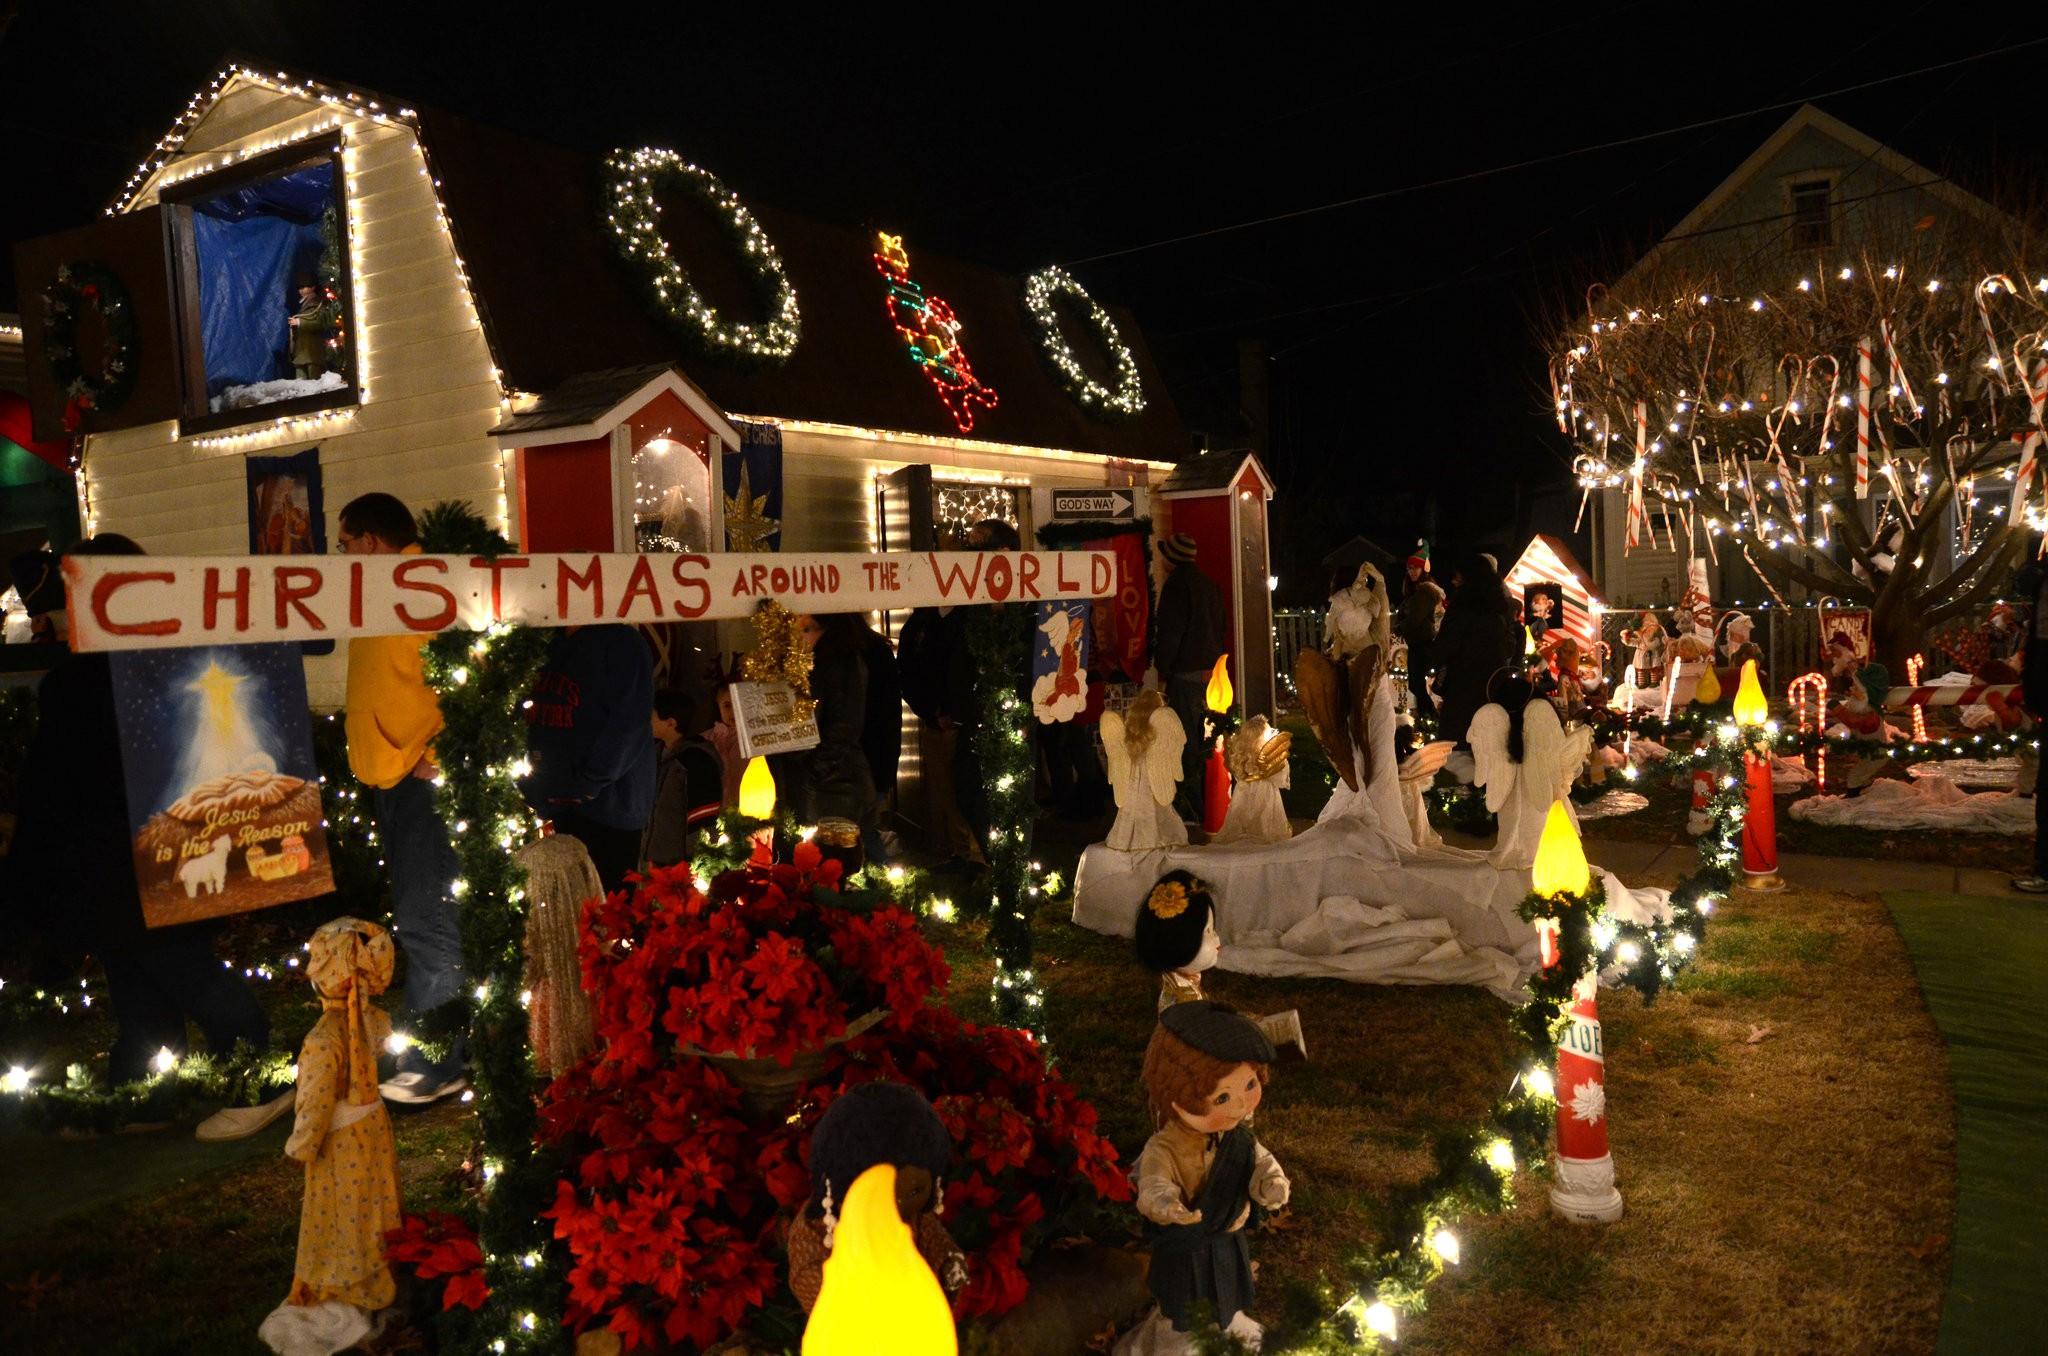 Pitman Christmas Lights 2020 Pitman's Hagerty family Christmas light spectacular brings North